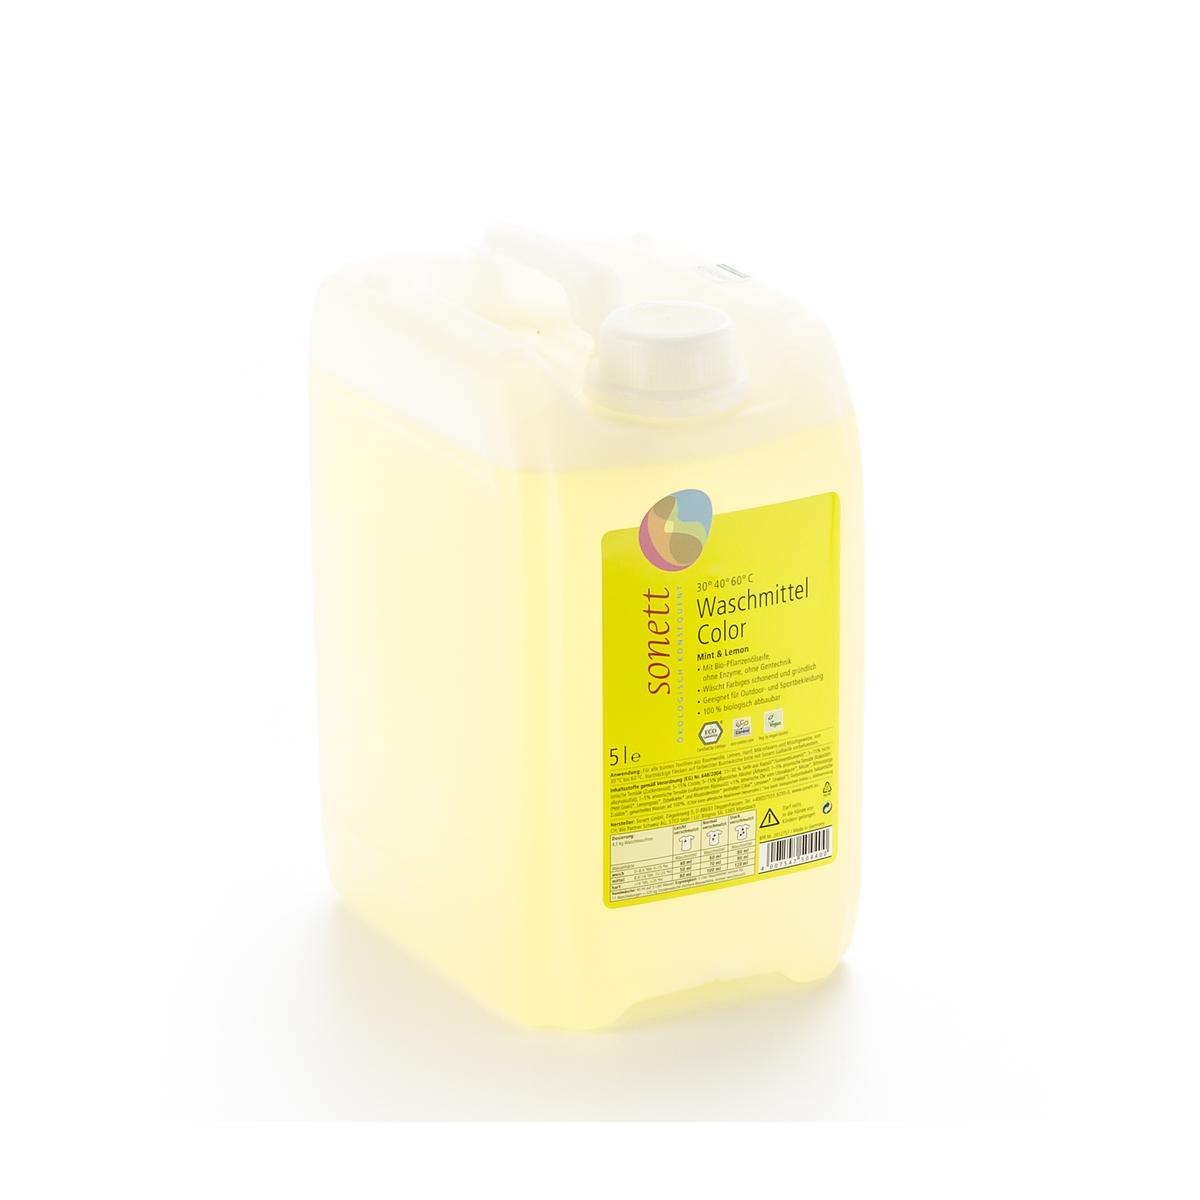 Waschmittel Color 30° 40° 60°C Mint Lemon flüssig Bidon 5 l - Sonett